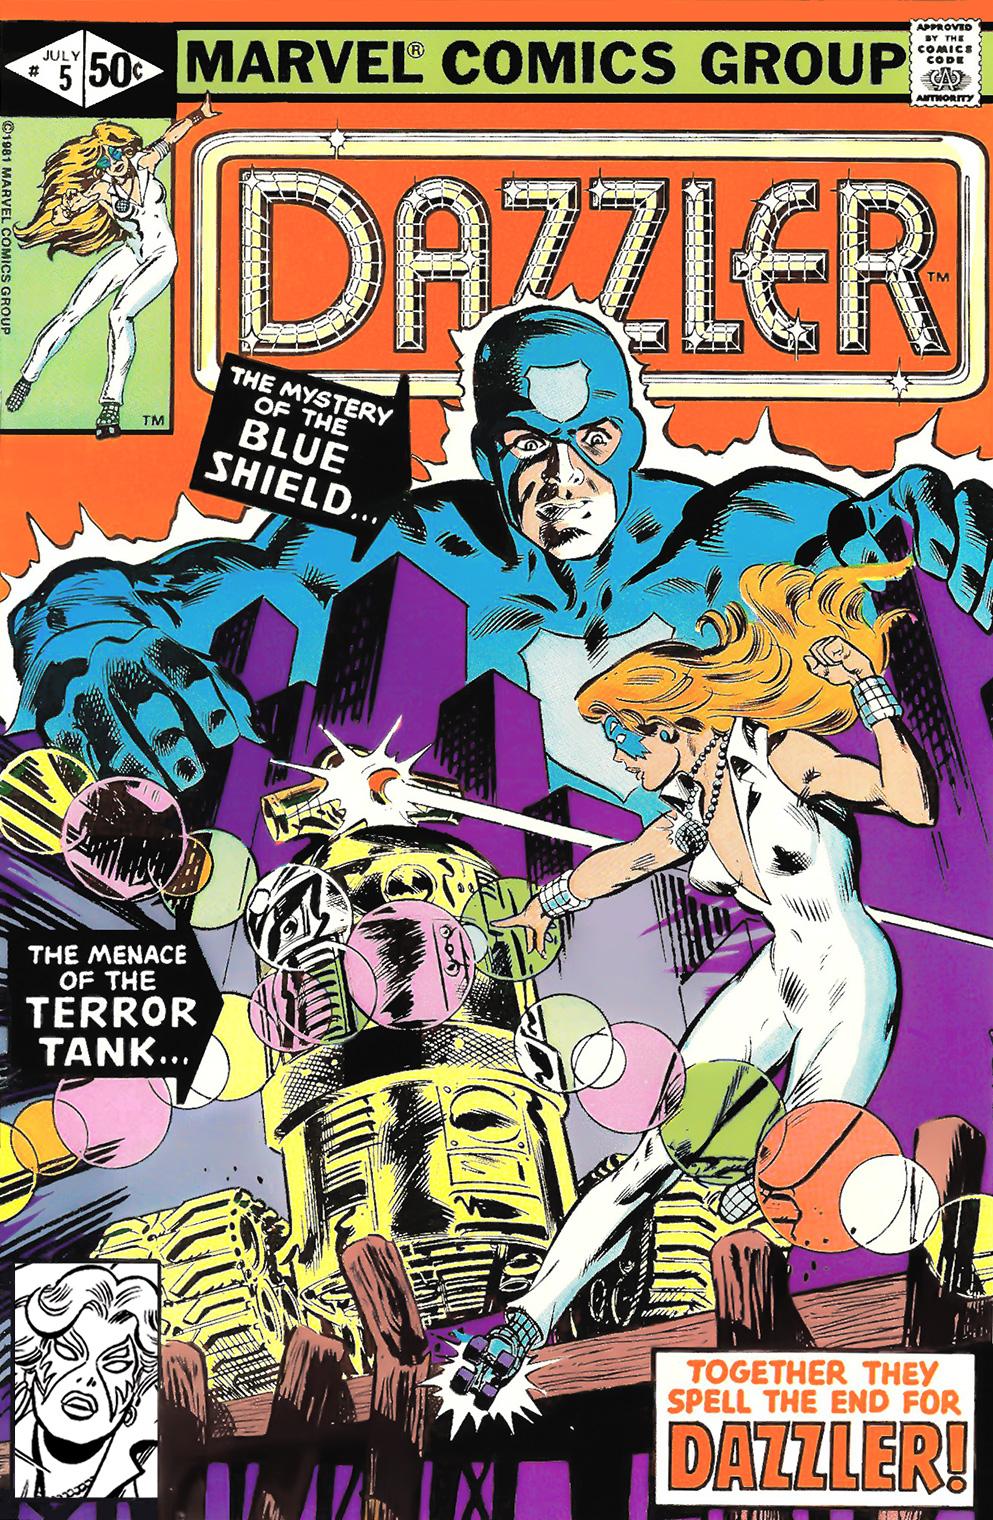 Dazzler (1981) #5